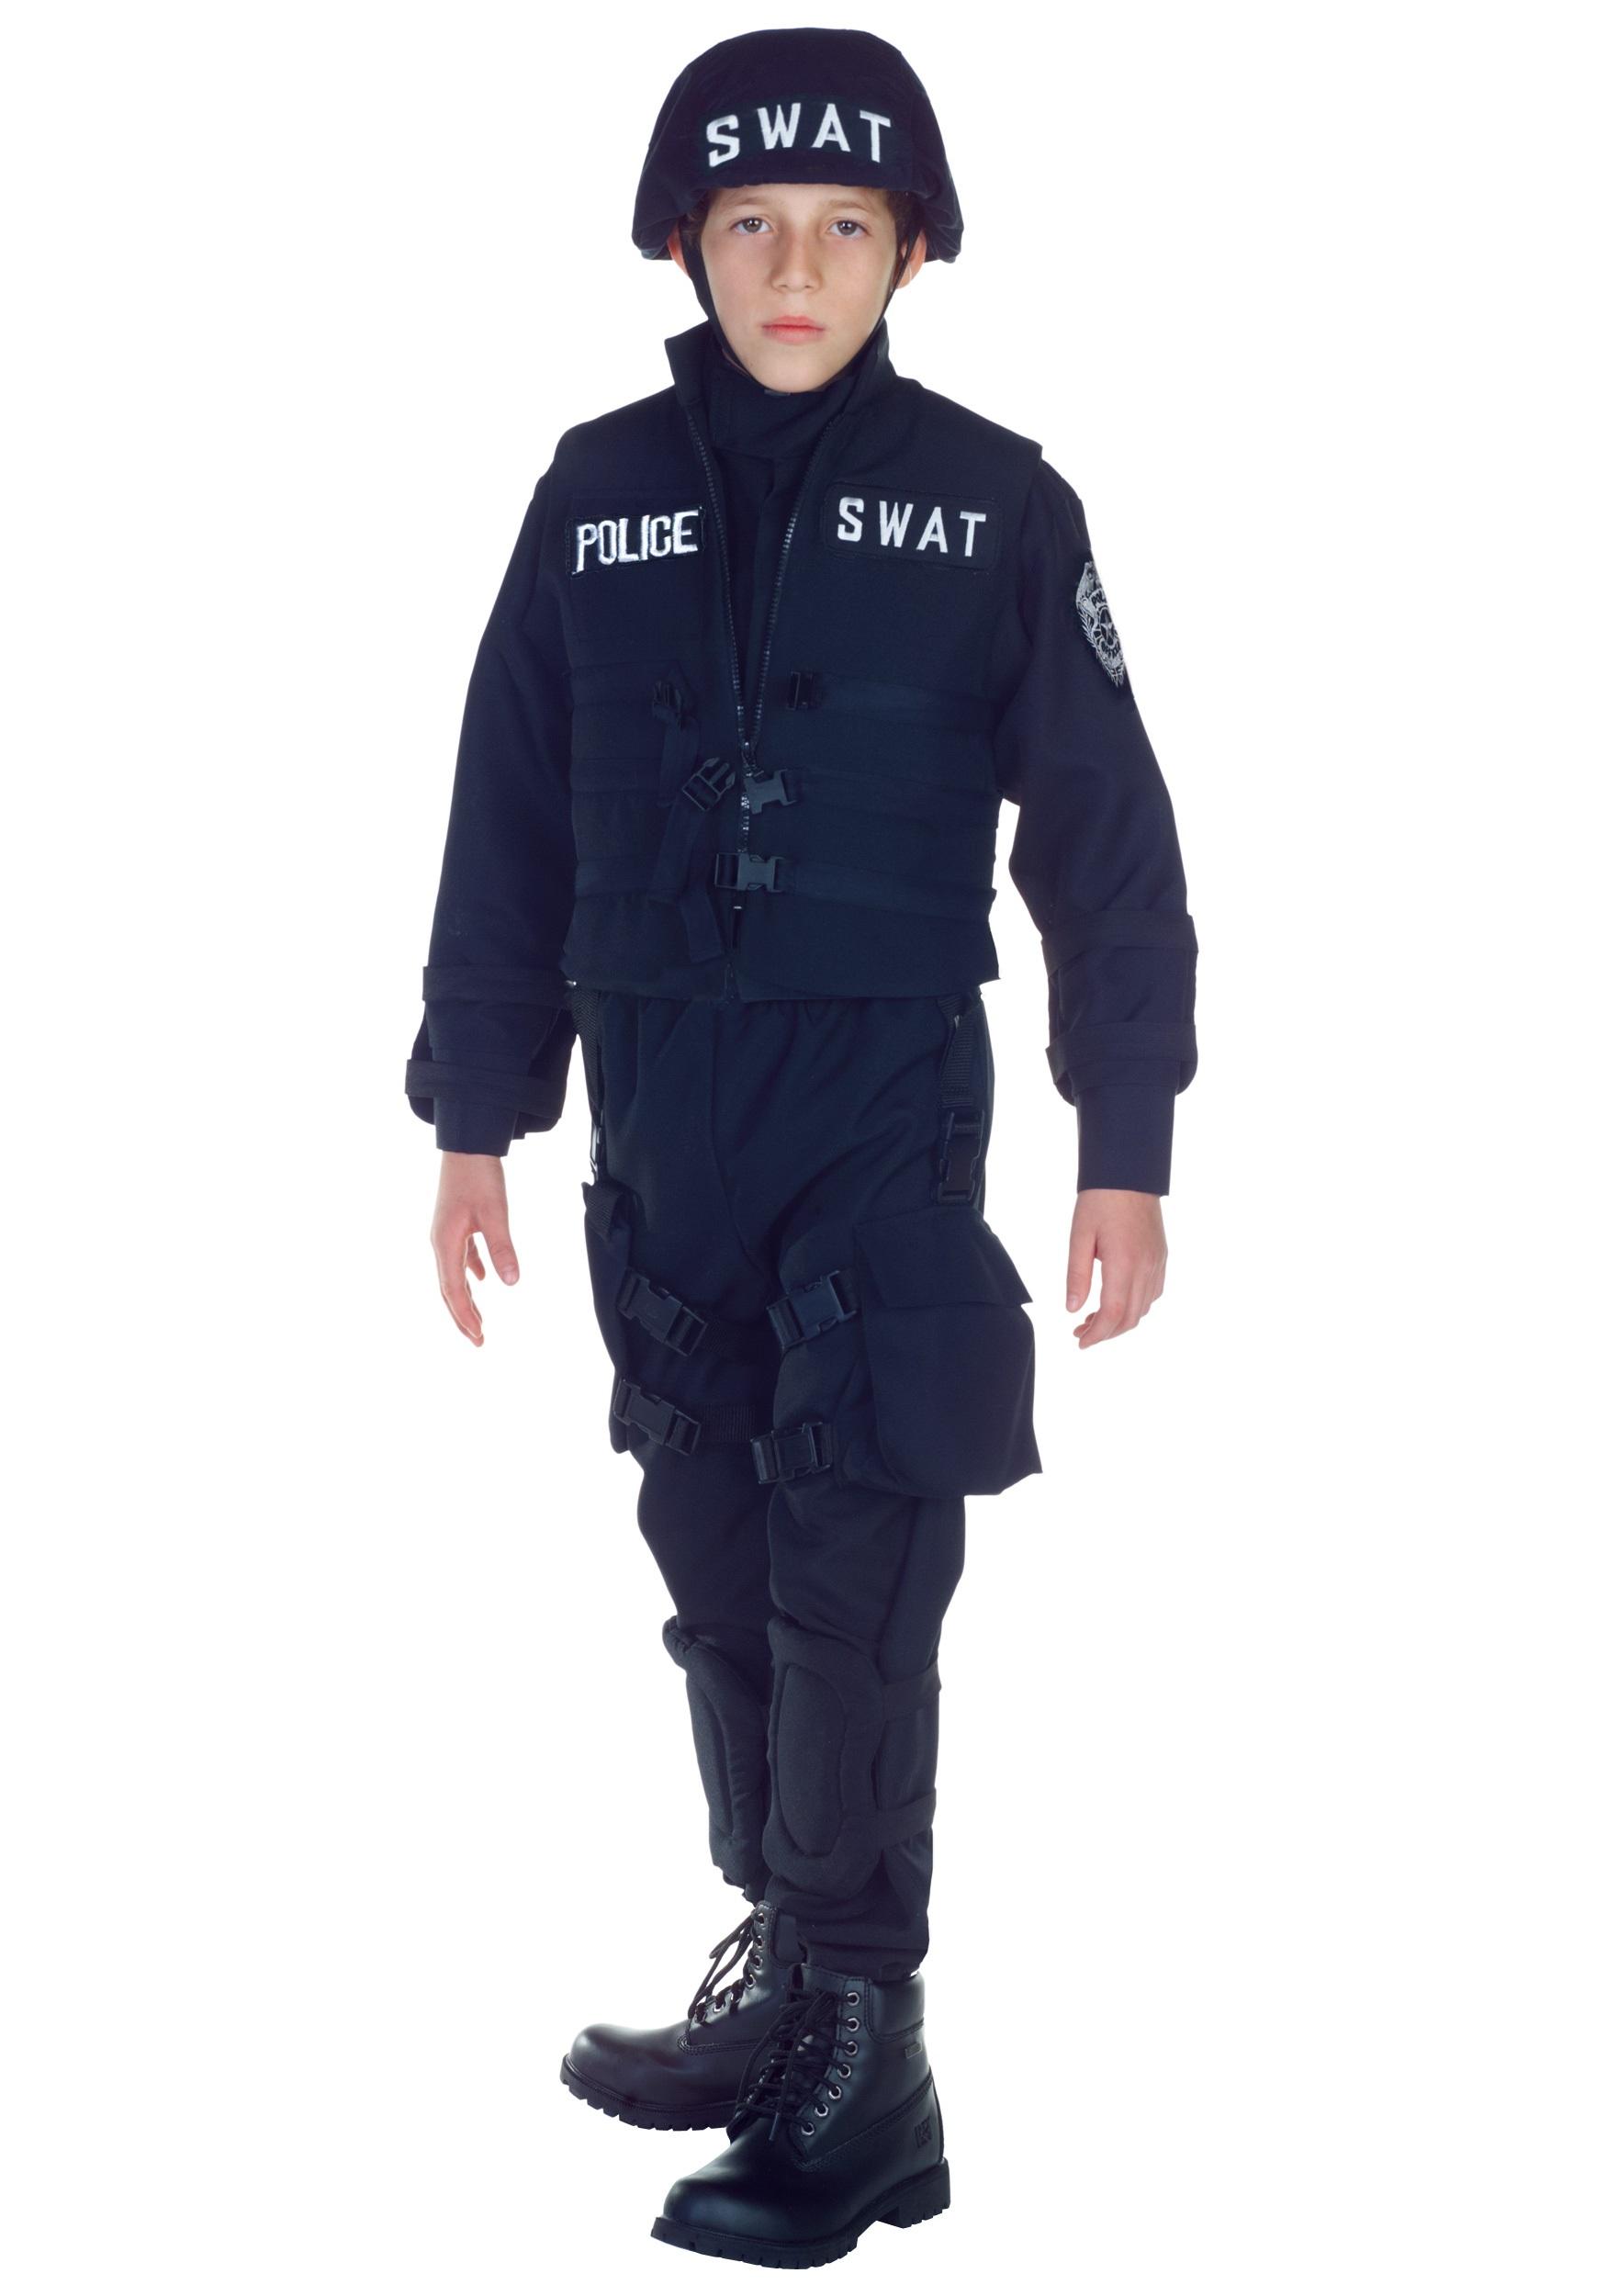 SWAT Team Officer Costume for Kids